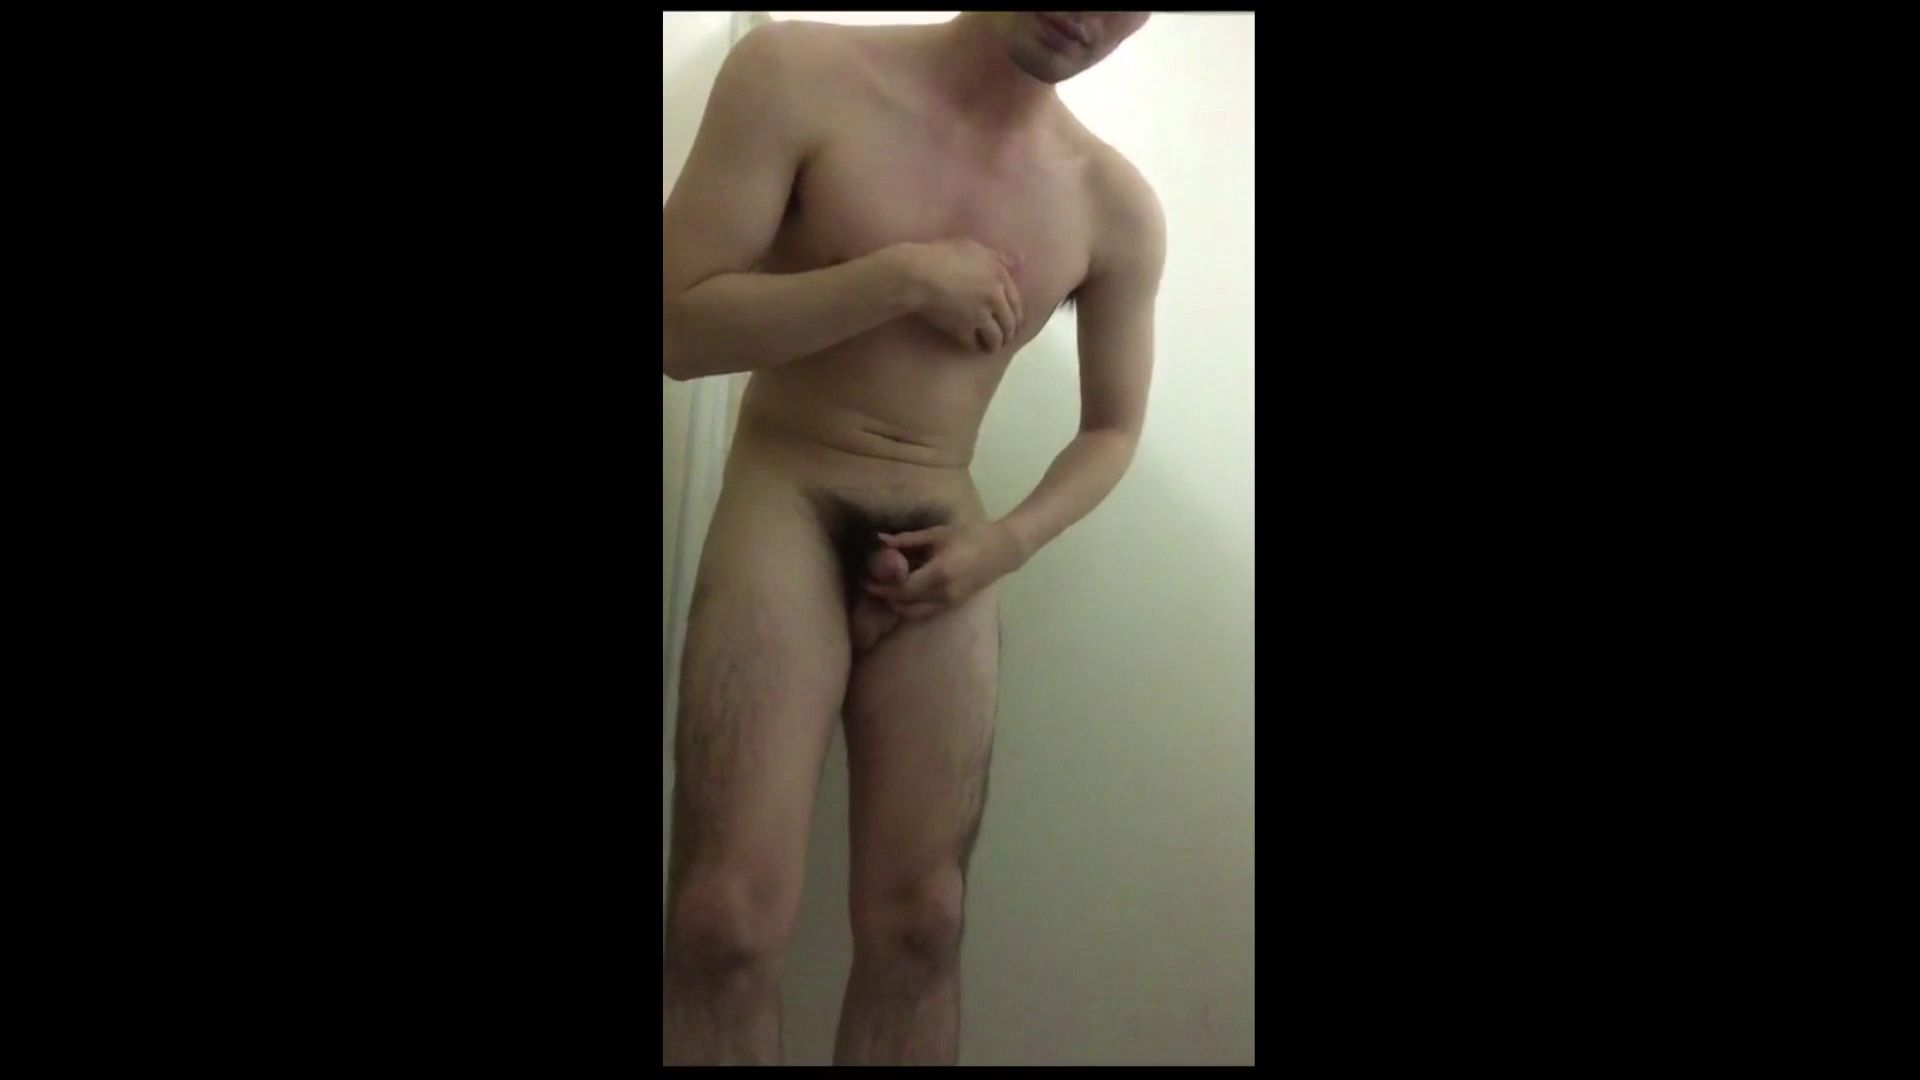 個人撮影 自慰の極意 Vol.3 無修正 ゲイ無修正動画画像 111pic 54